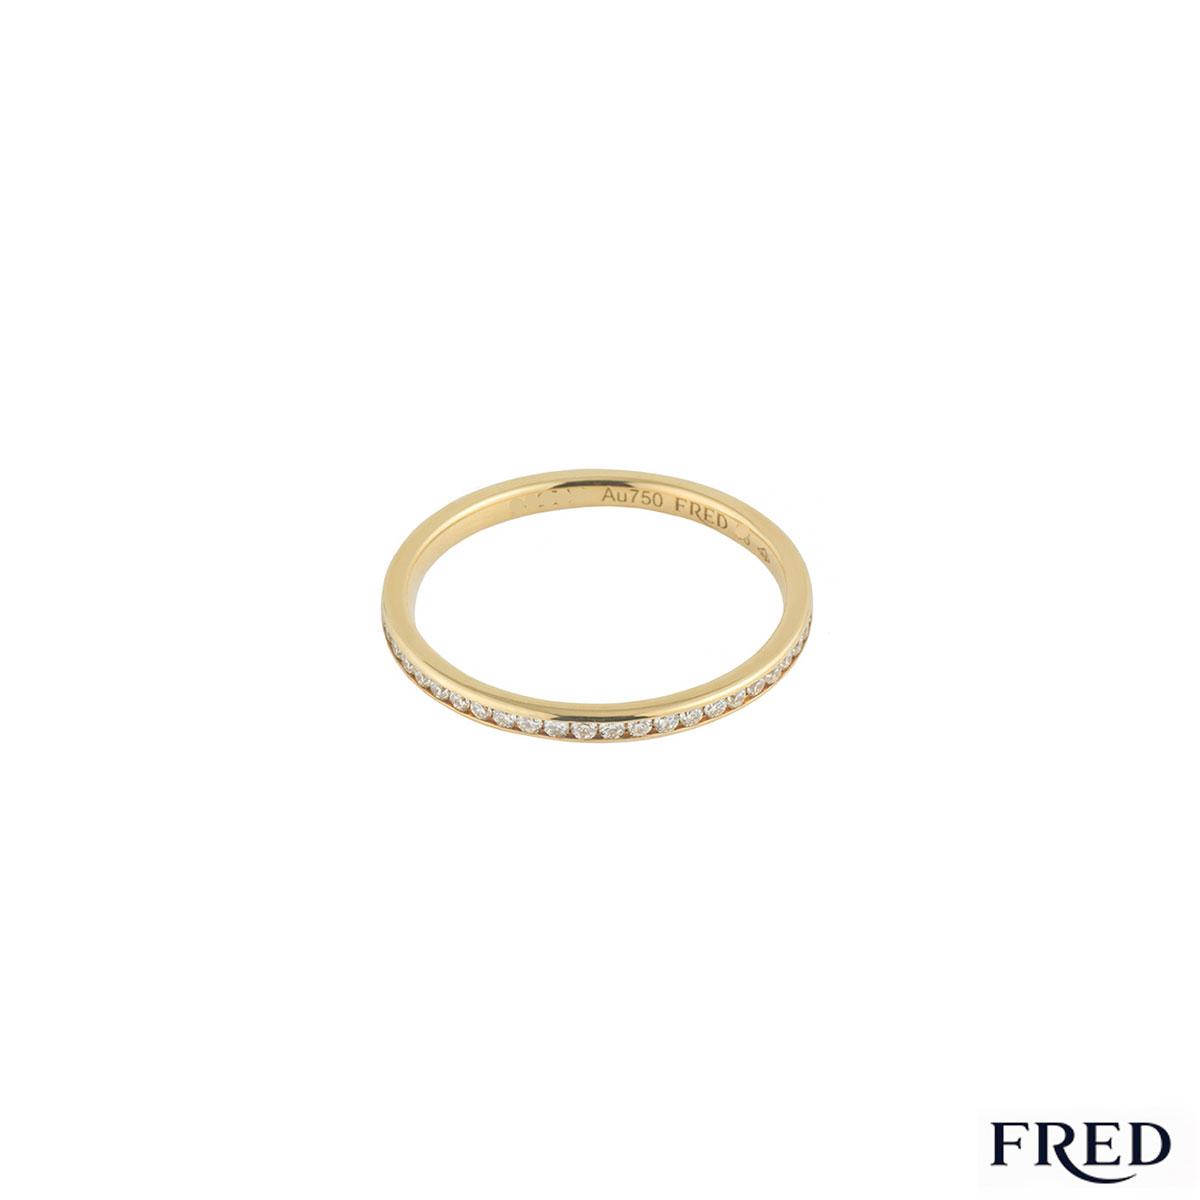 Fred Yellow Gold Full Diamond Eternity Ring 0.36ct G+/VS+